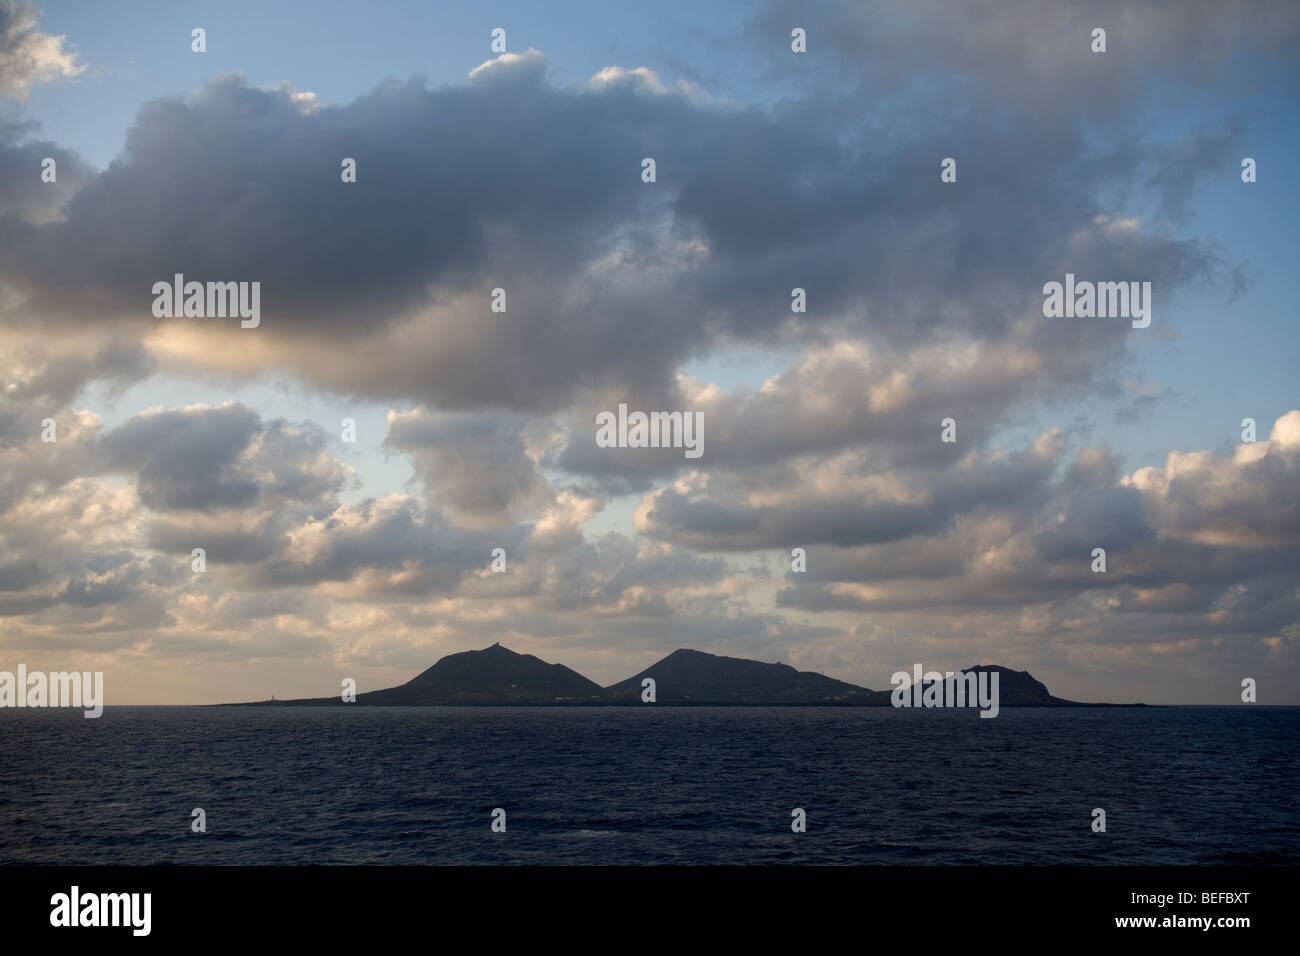 Linosa island on the Mediterranean sea - Stock Image